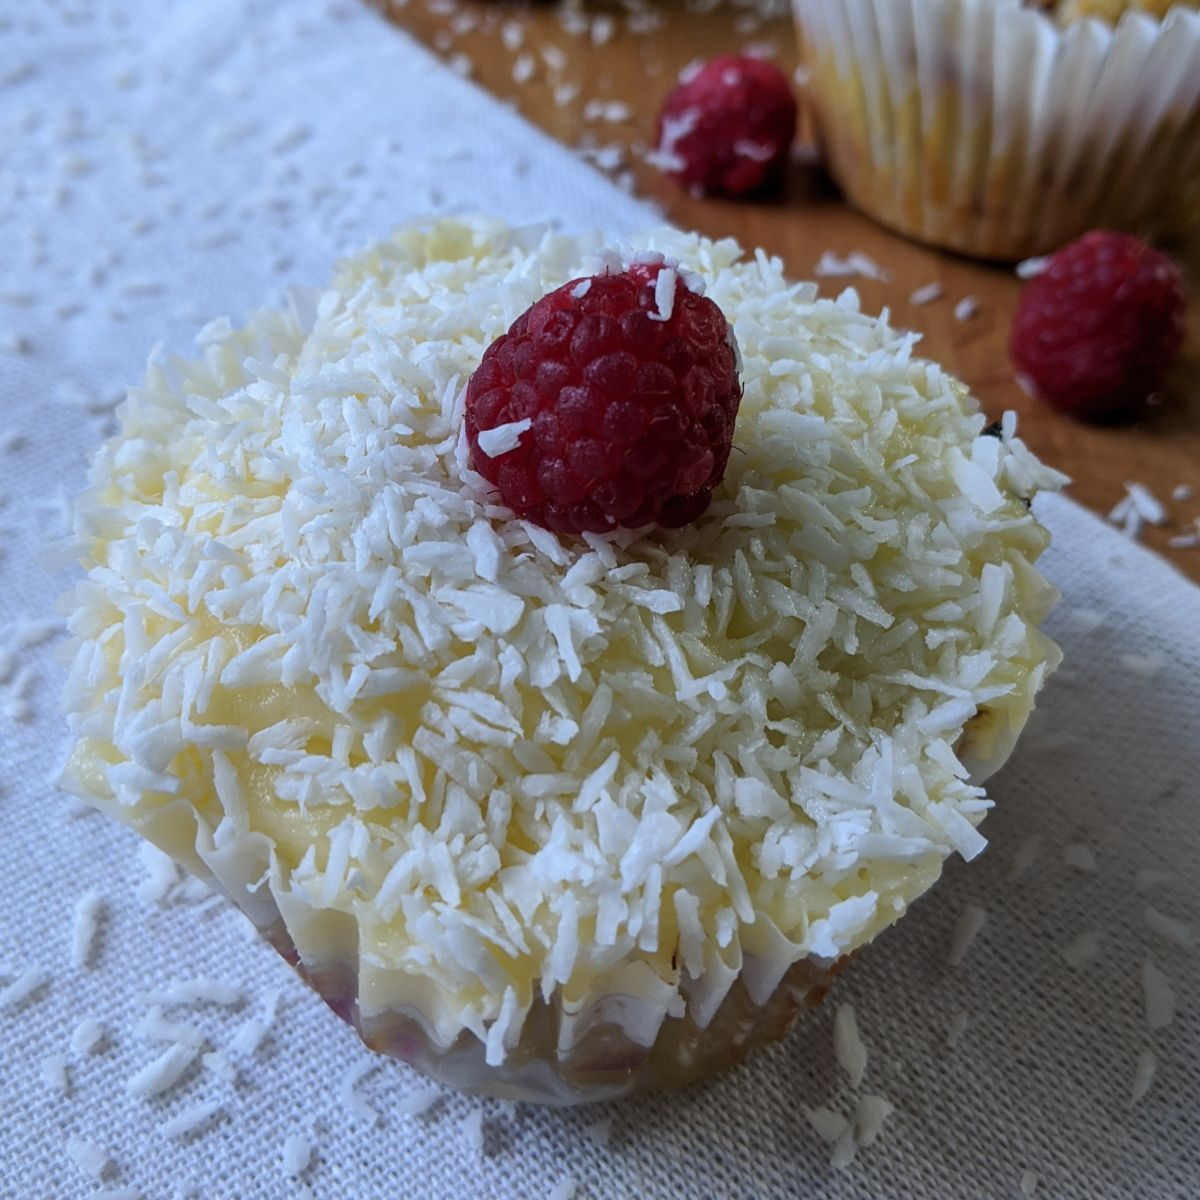 keto raspberry cupcakes